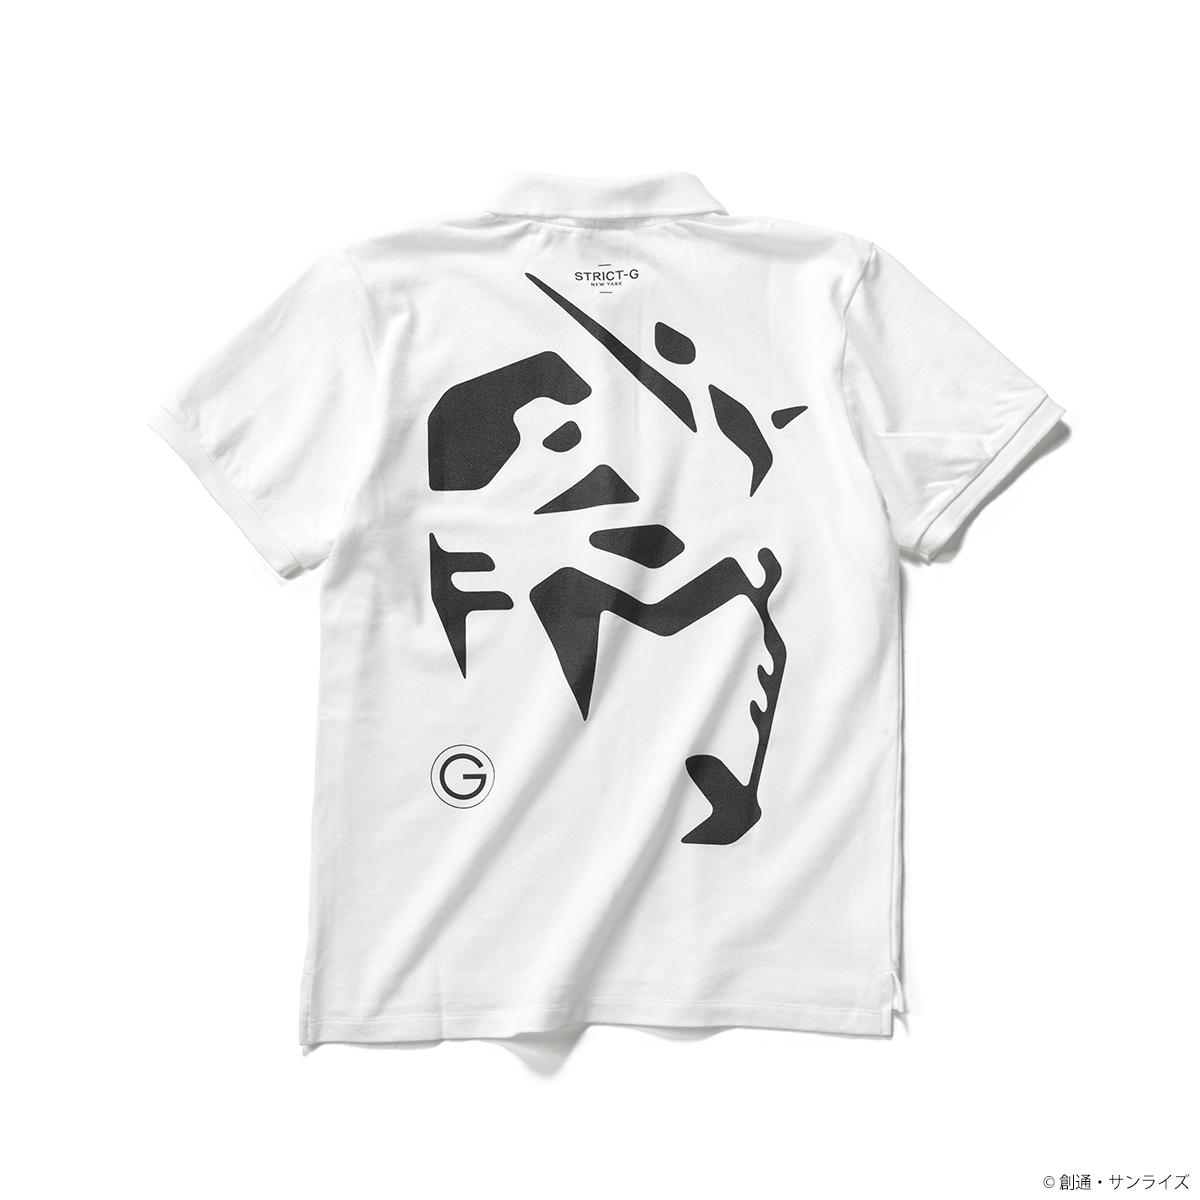 STRICT-G NEW YARK 新作Tシャツ&ポロシャツ、6月22日(土)より発売!